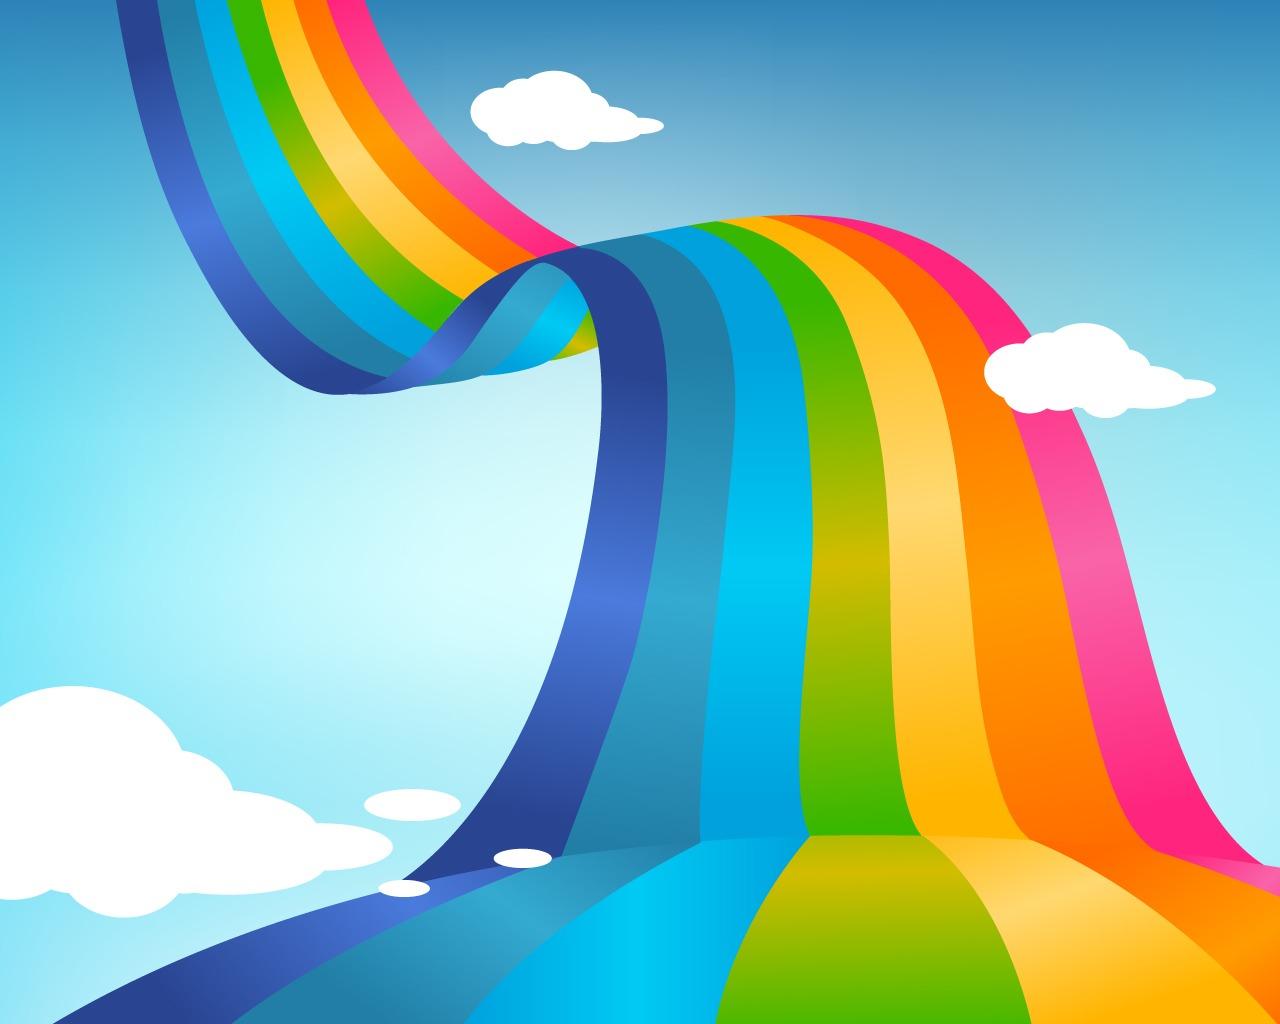 Картинки рисунков с радугой